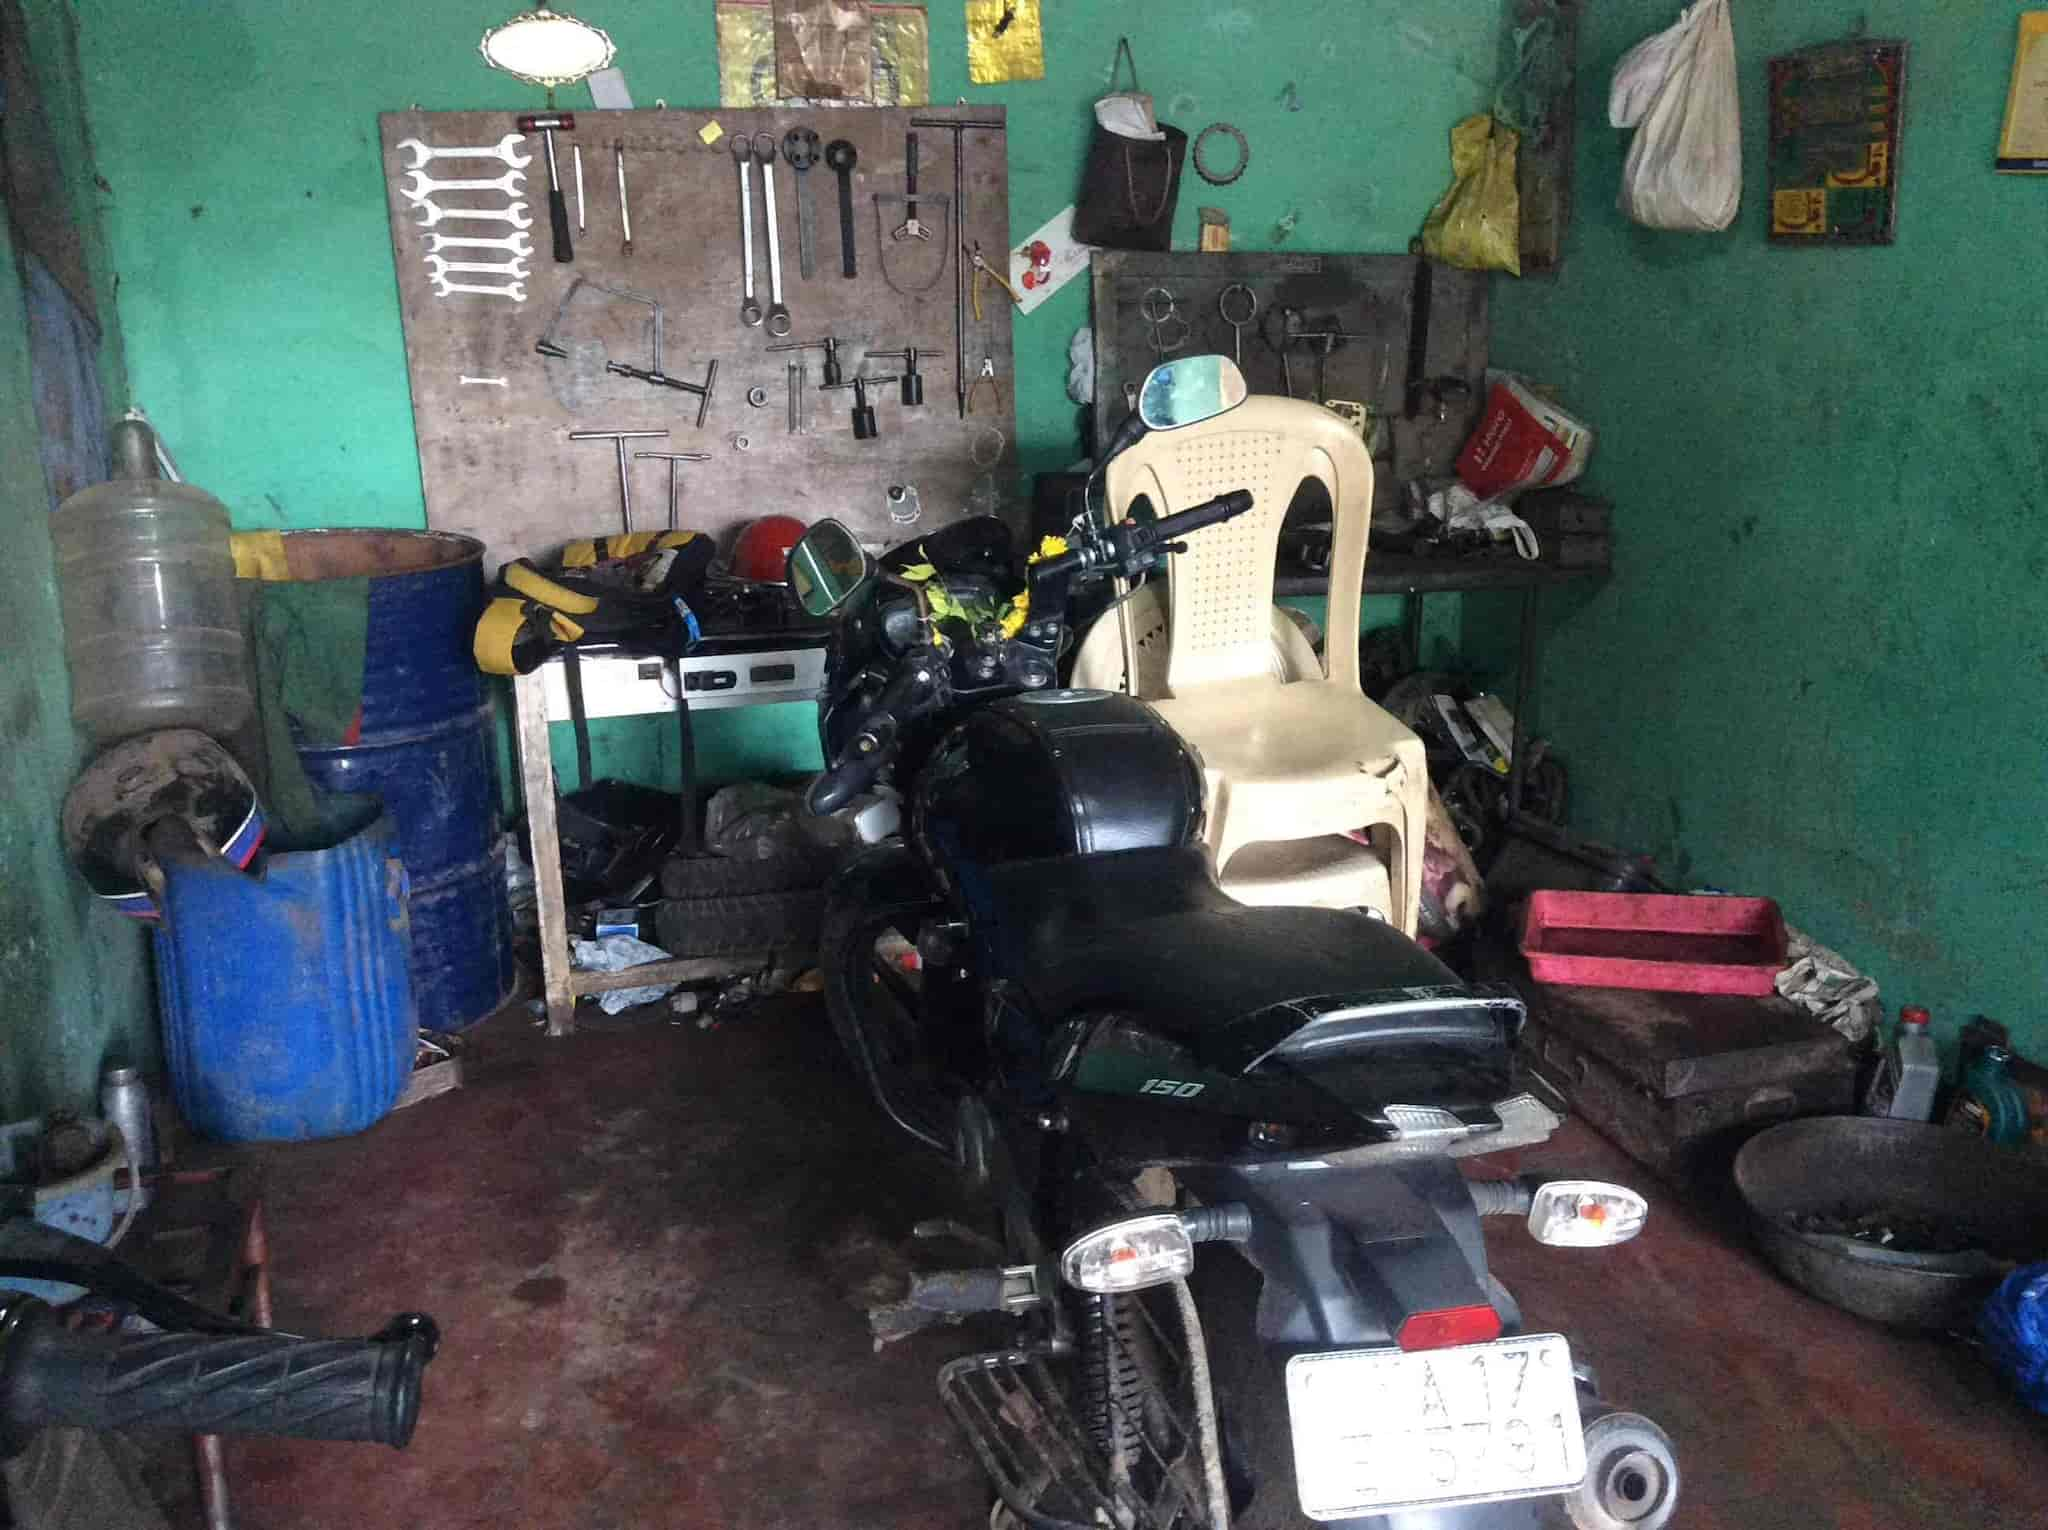 M R Bike Point, Near Food Court, - Motorcycle Repair